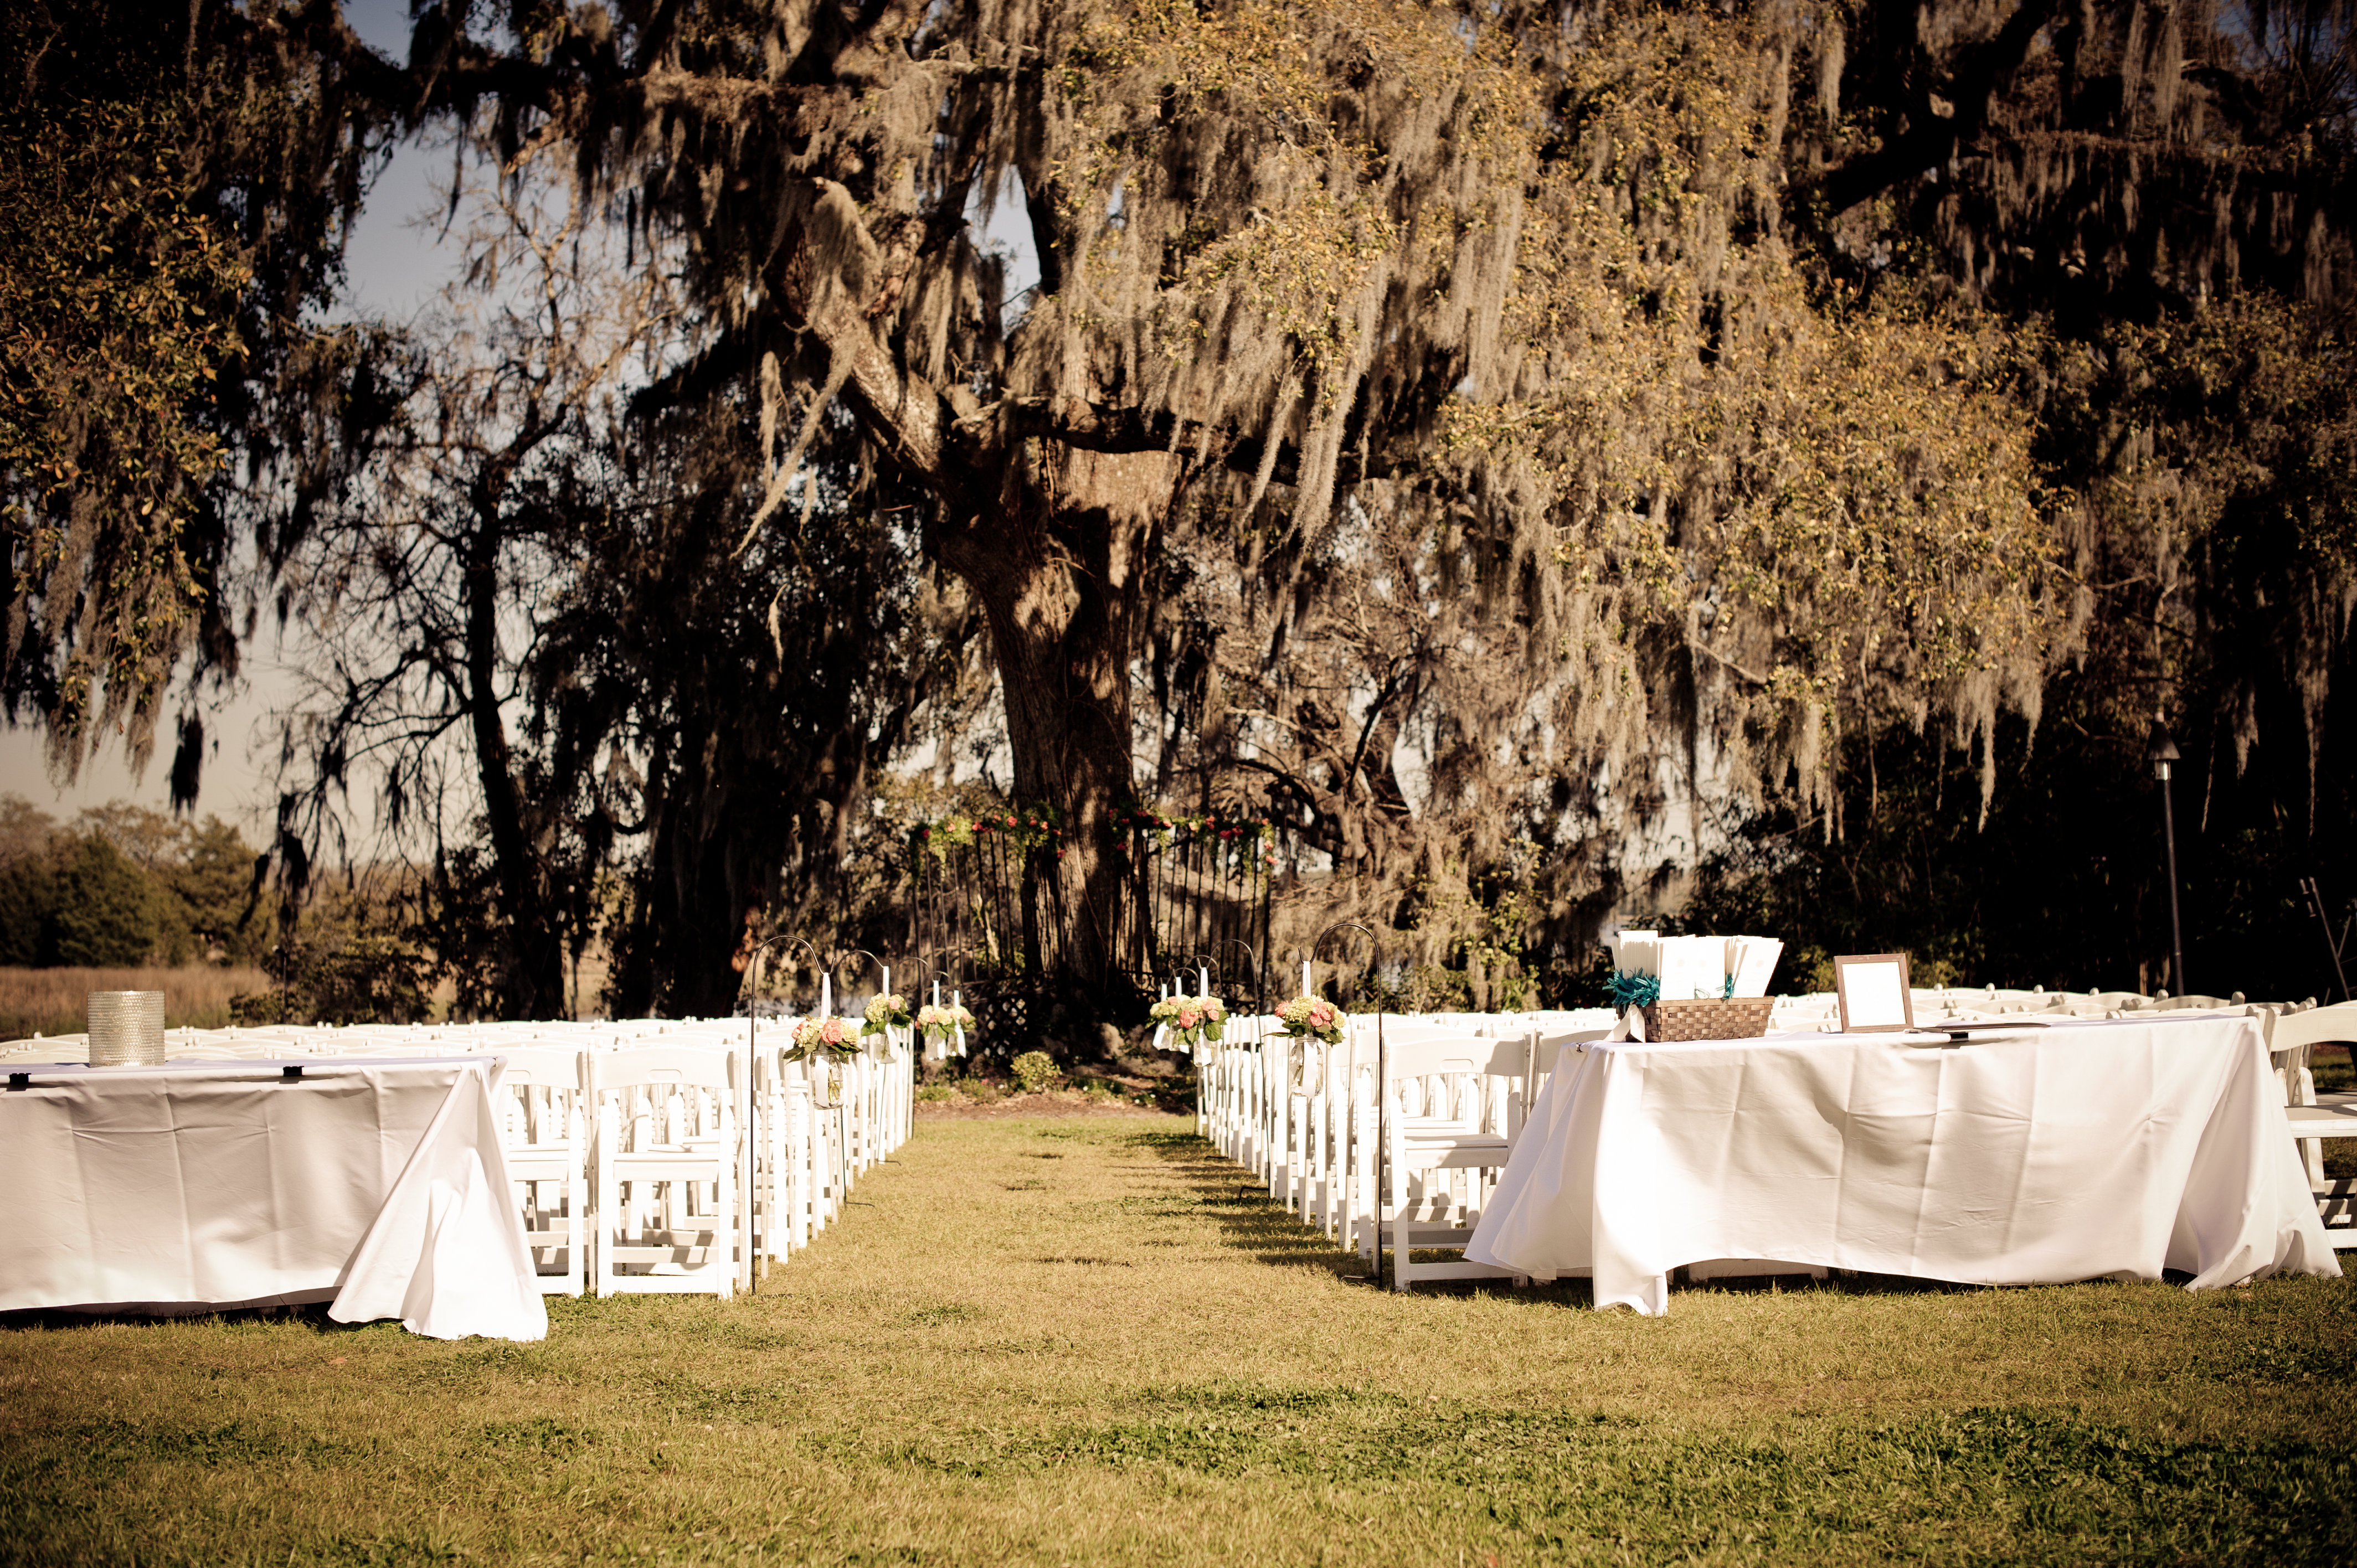 The Carriage House at Magnolia Plantation